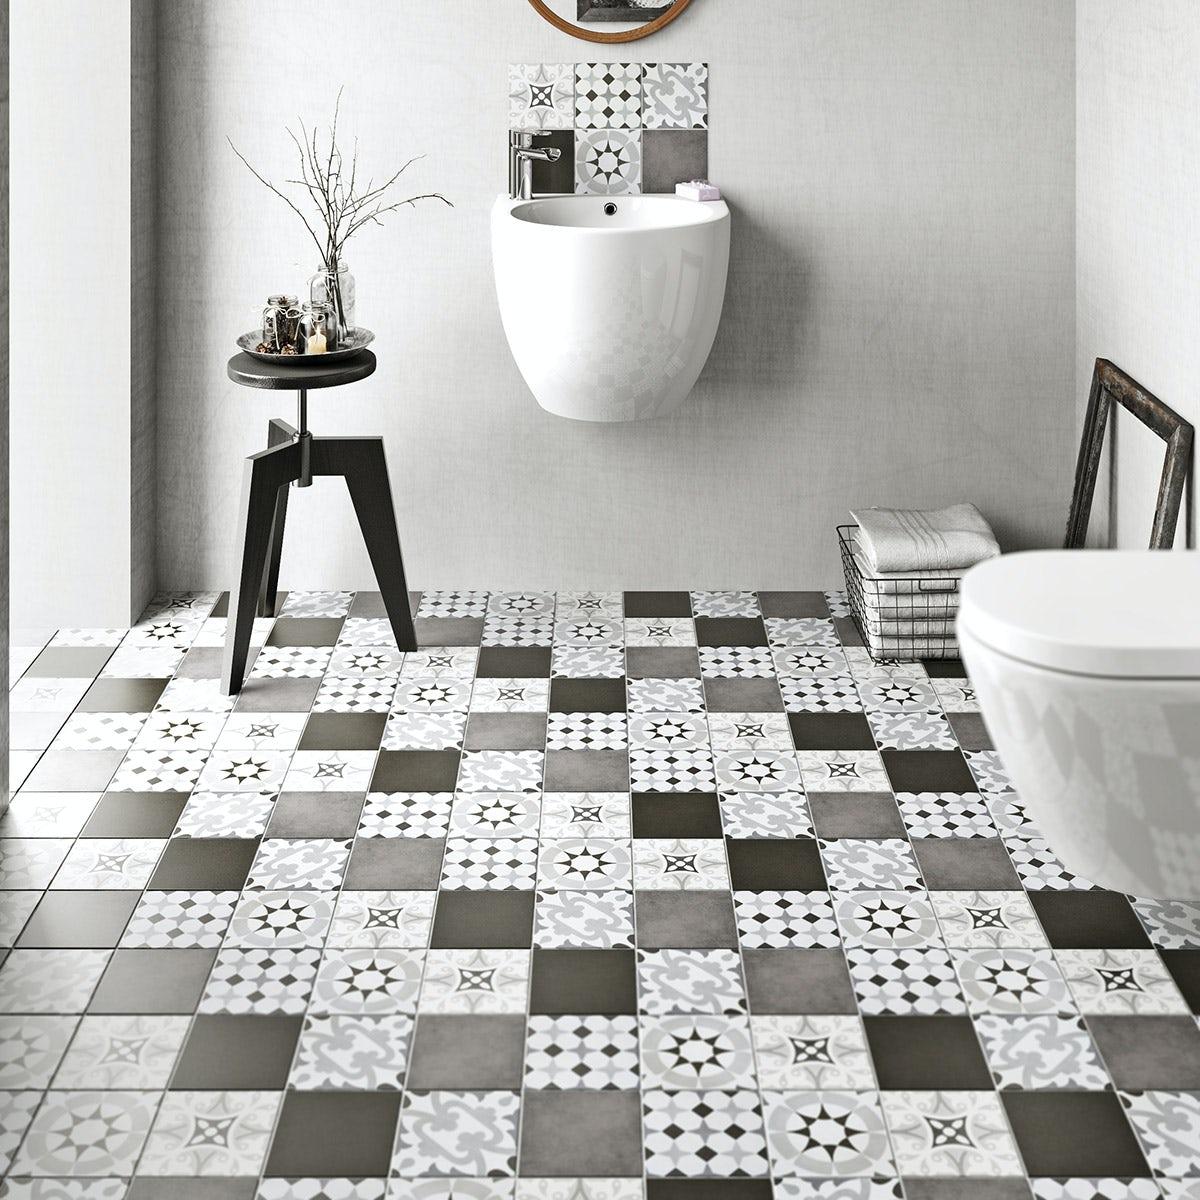 British Ceramic Tile Patchwork Pattern Grey Matt Tile